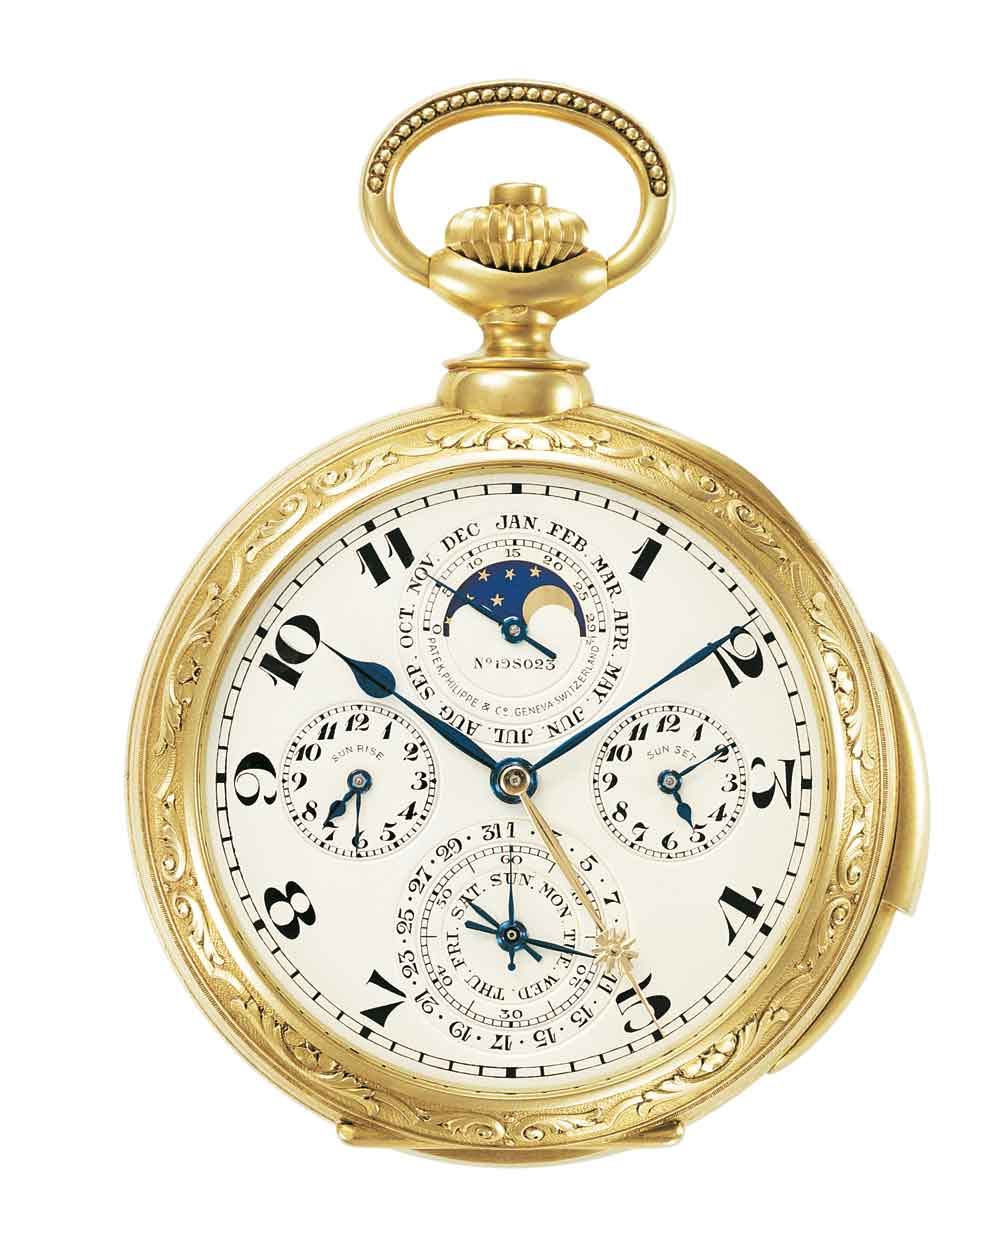 Reloj bolsillo Patek Philippe James Ward Packard